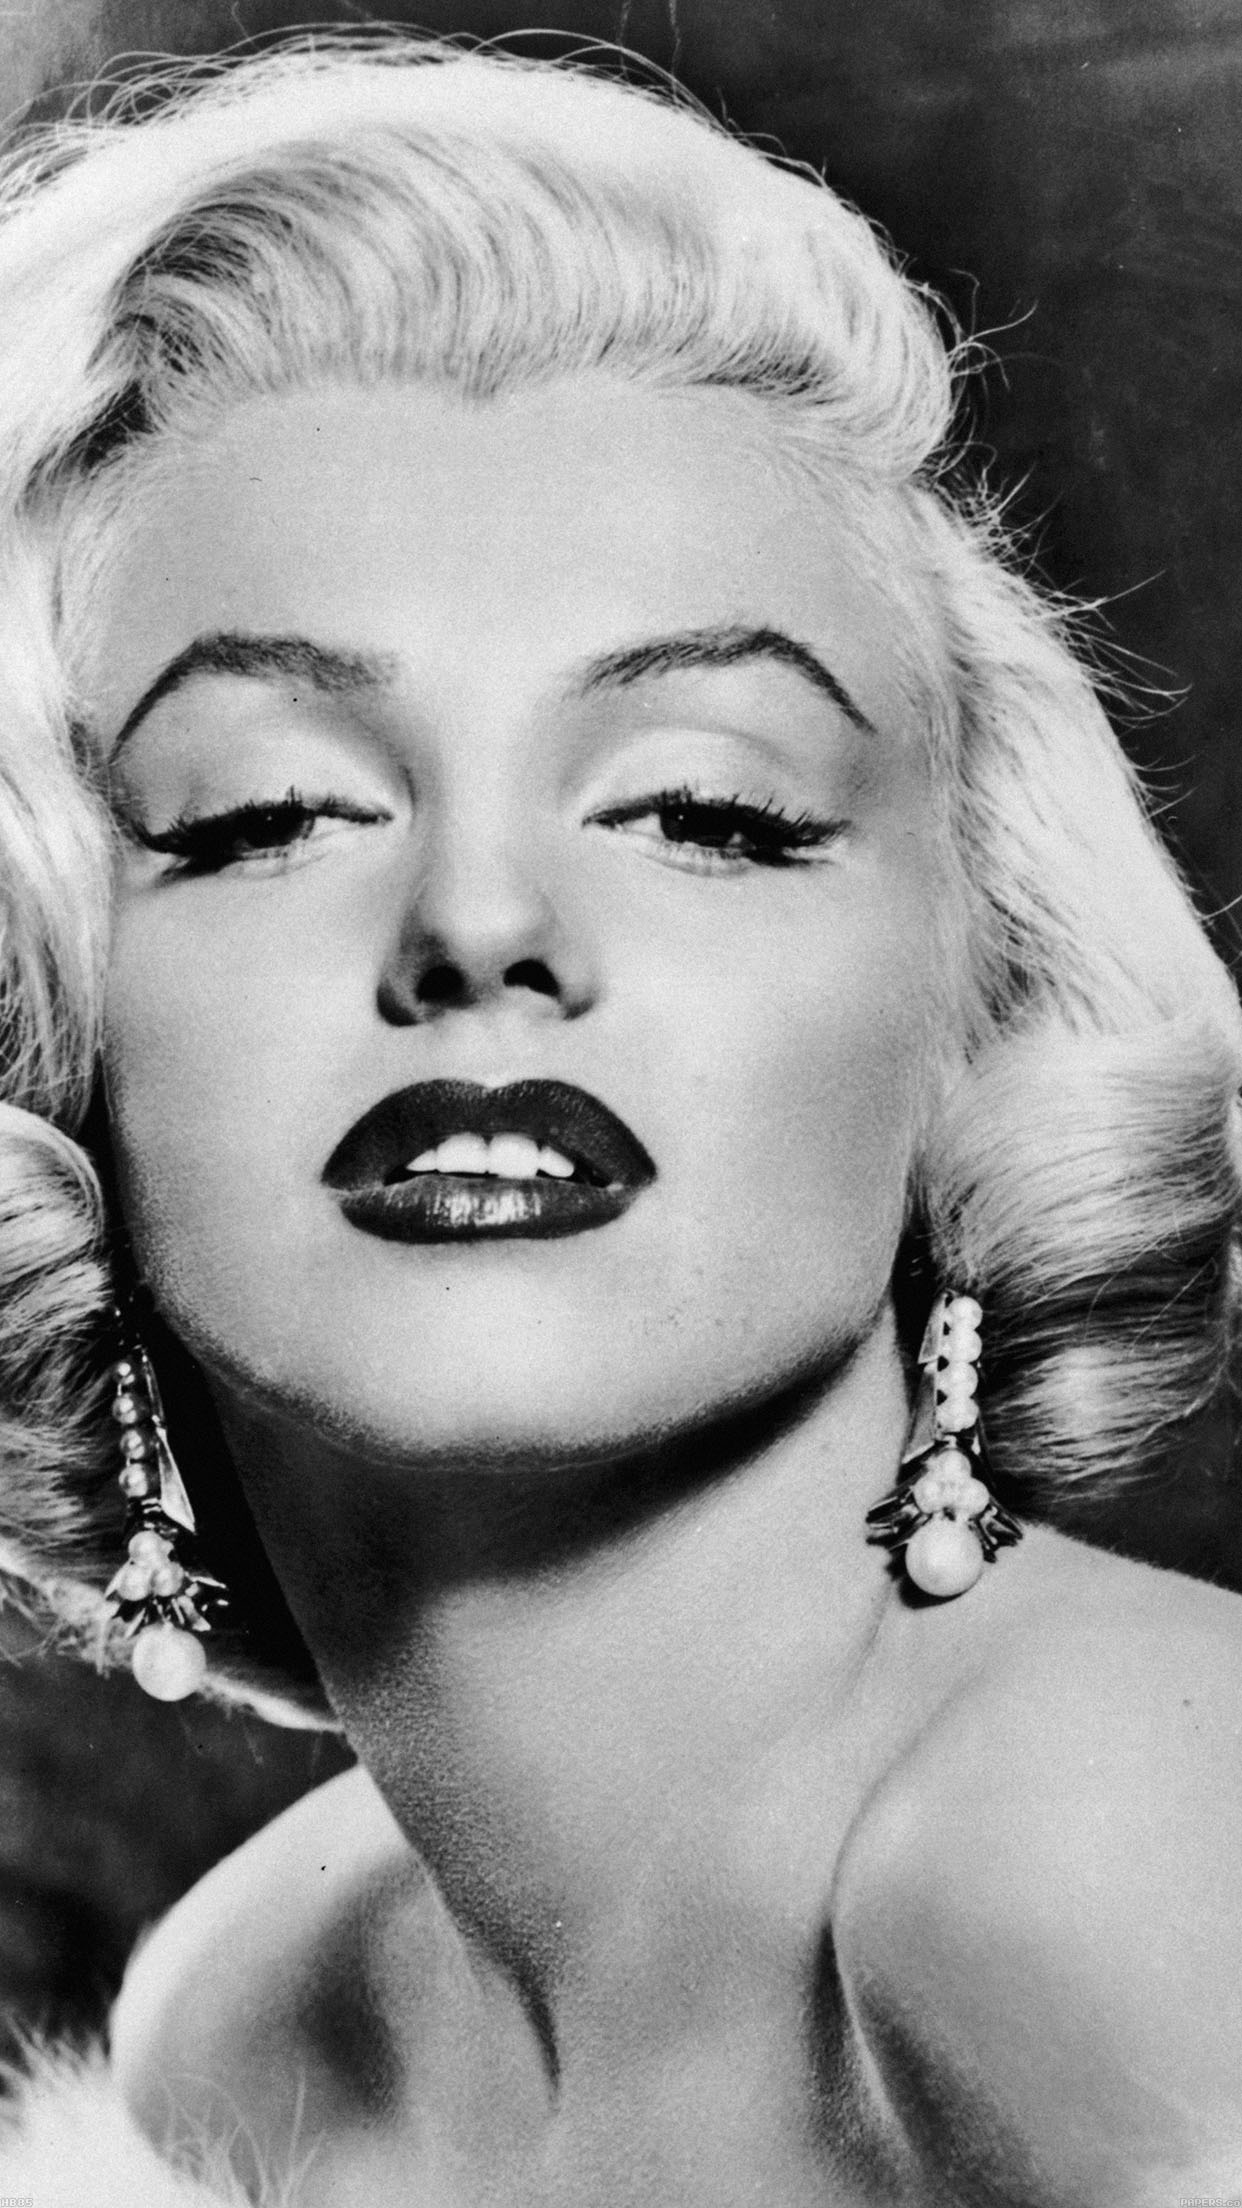 Gangsta Girl Wallpaper Hd Hb85 Marilyn Monroe Sexy Classic Papers Co